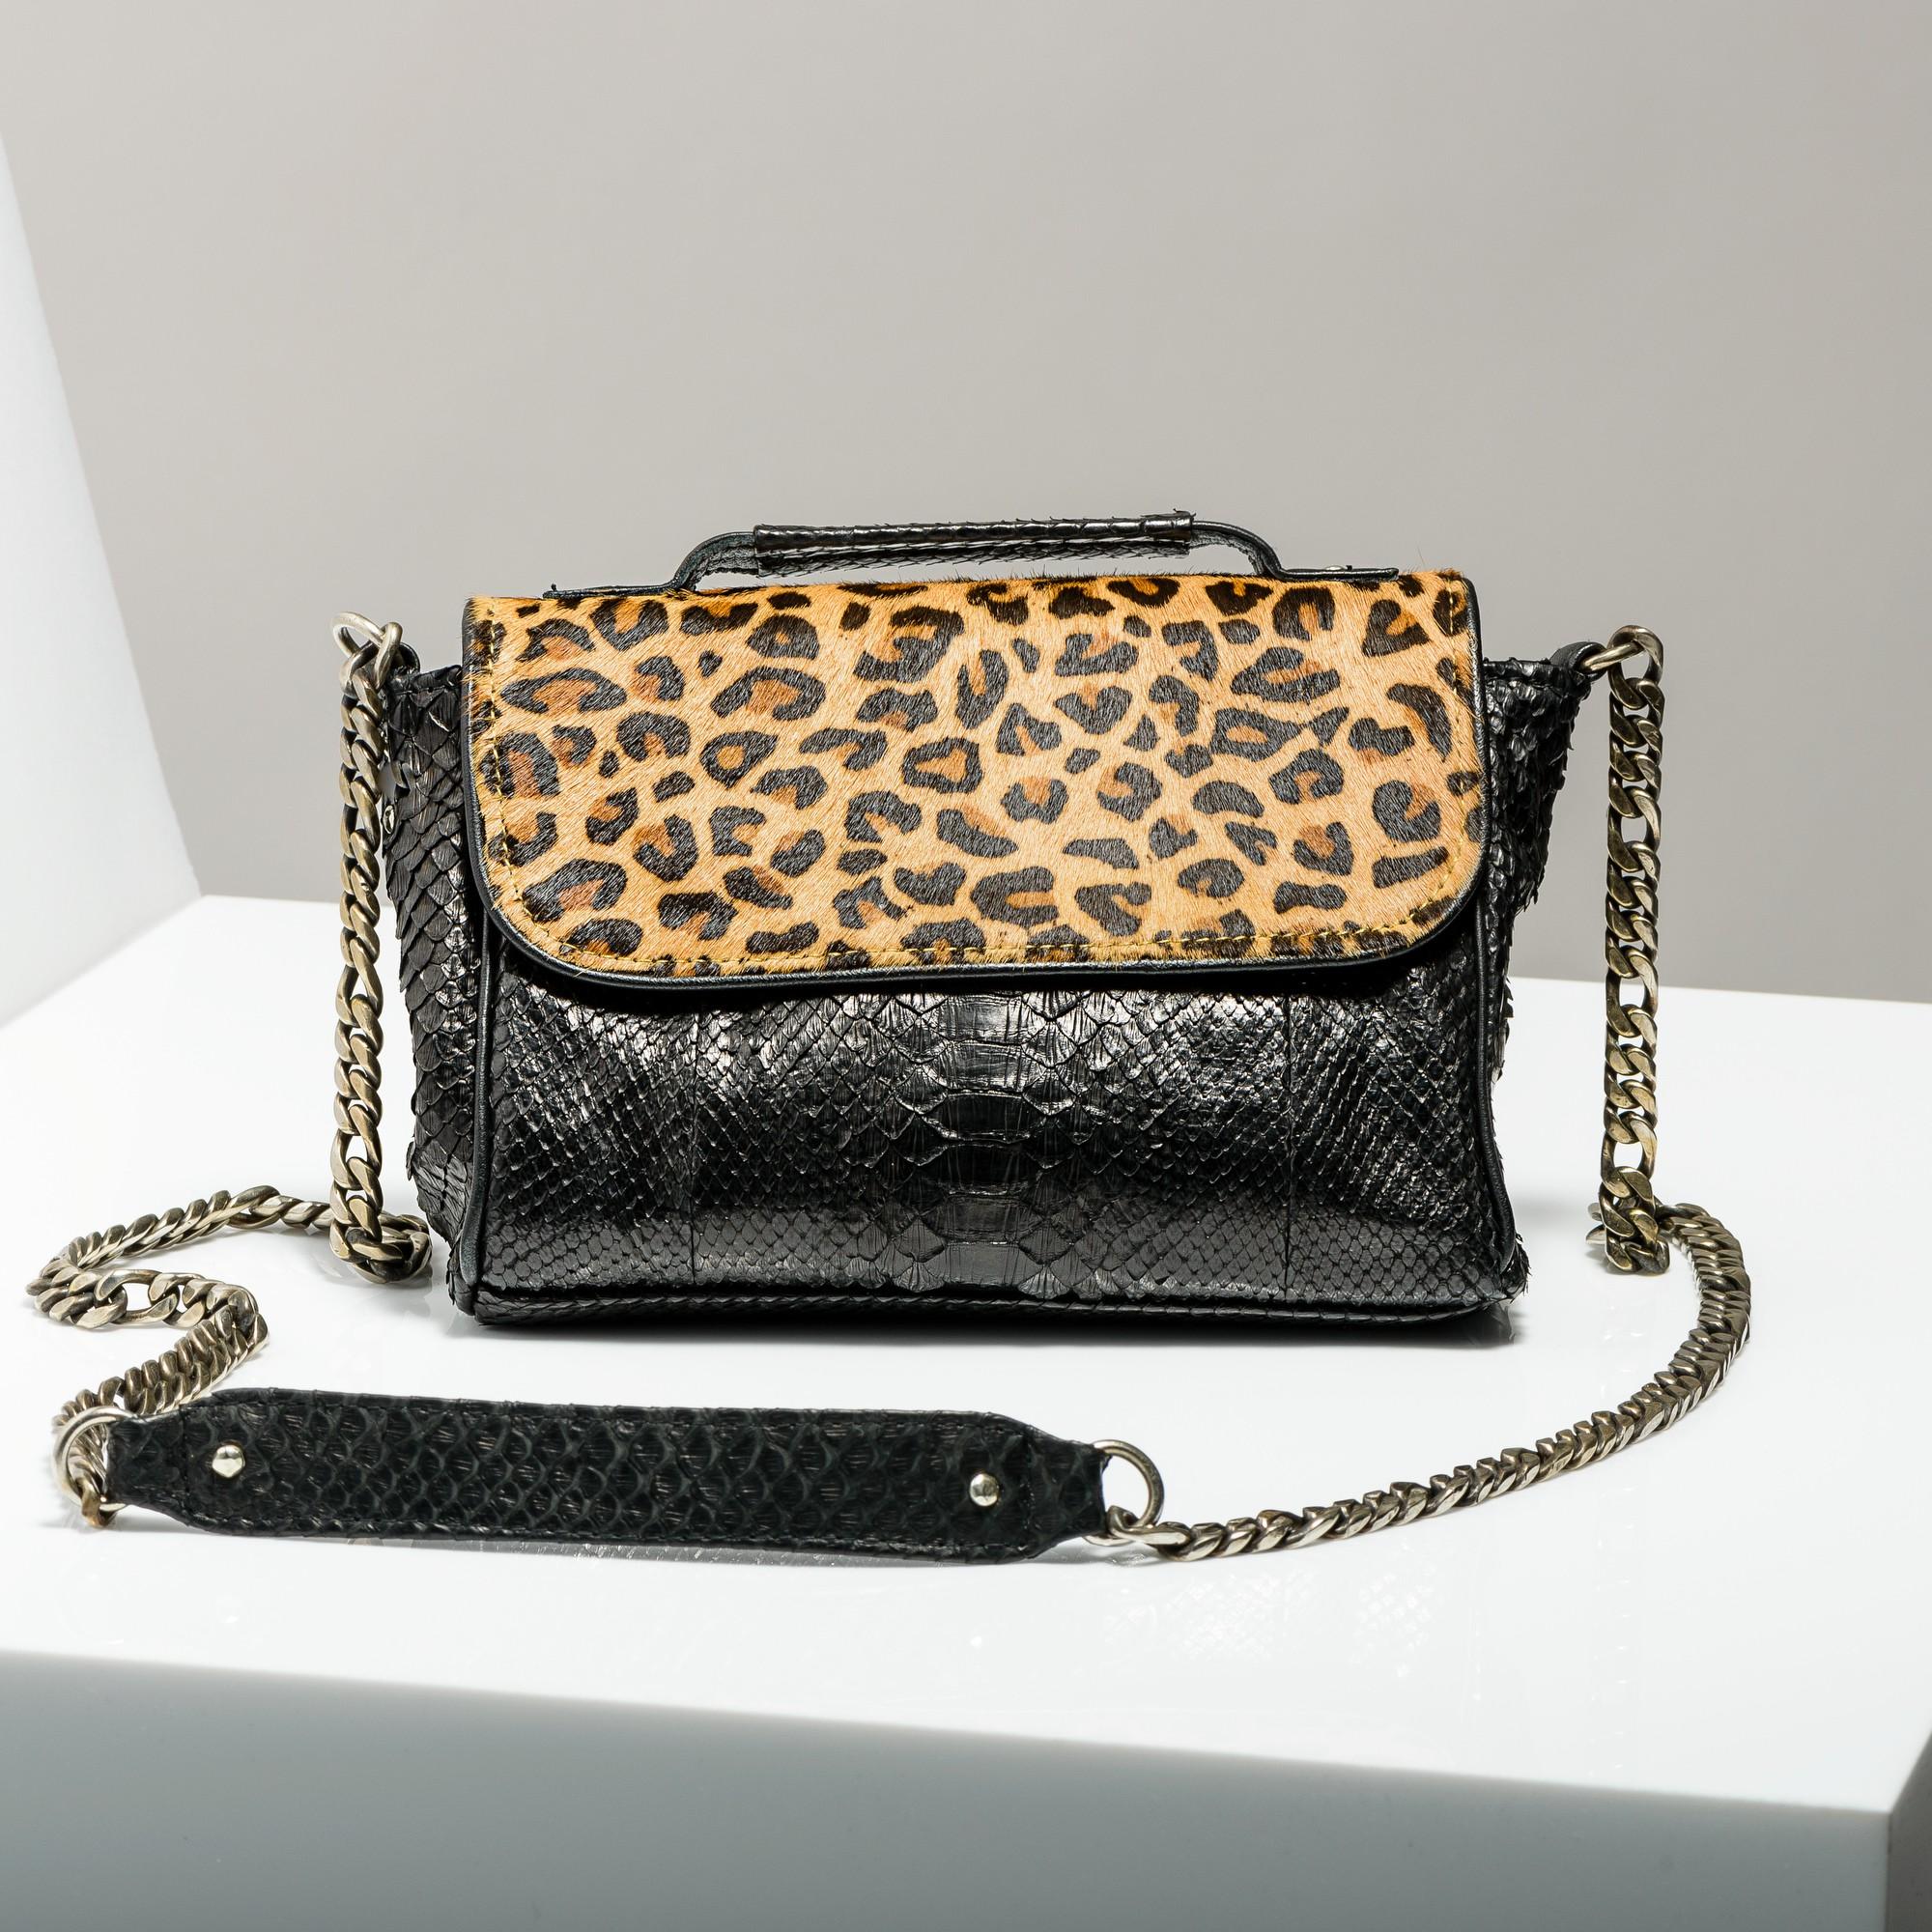 sac a main leopard tammy d mott blog. Black Bedroom Furniture Sets. Home Design Ideas